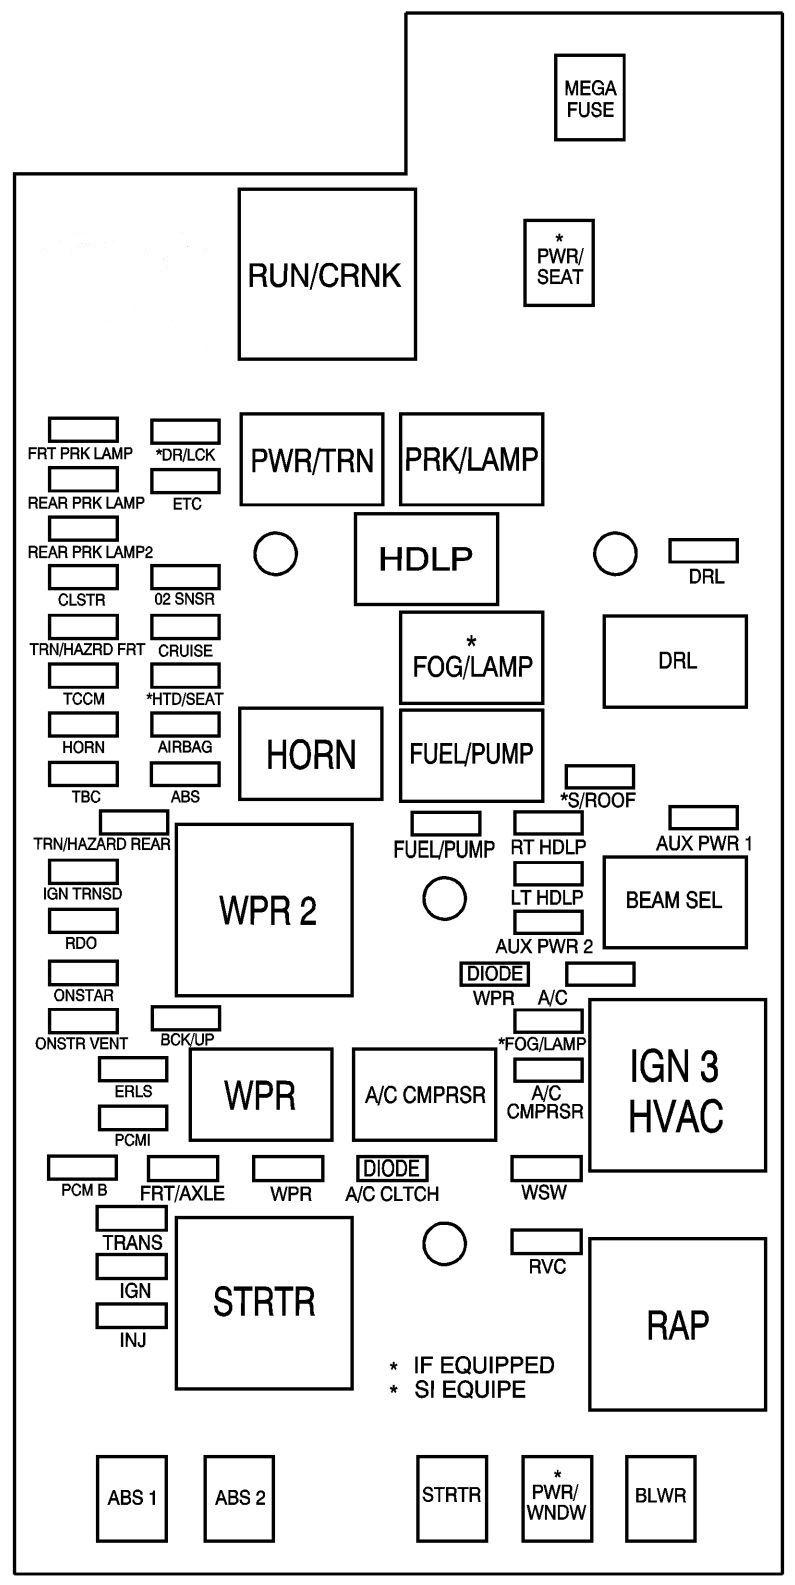 Hyundai Tucson Fuse Box Diagram On 2004 Chevy Malibu Wiring Diagram